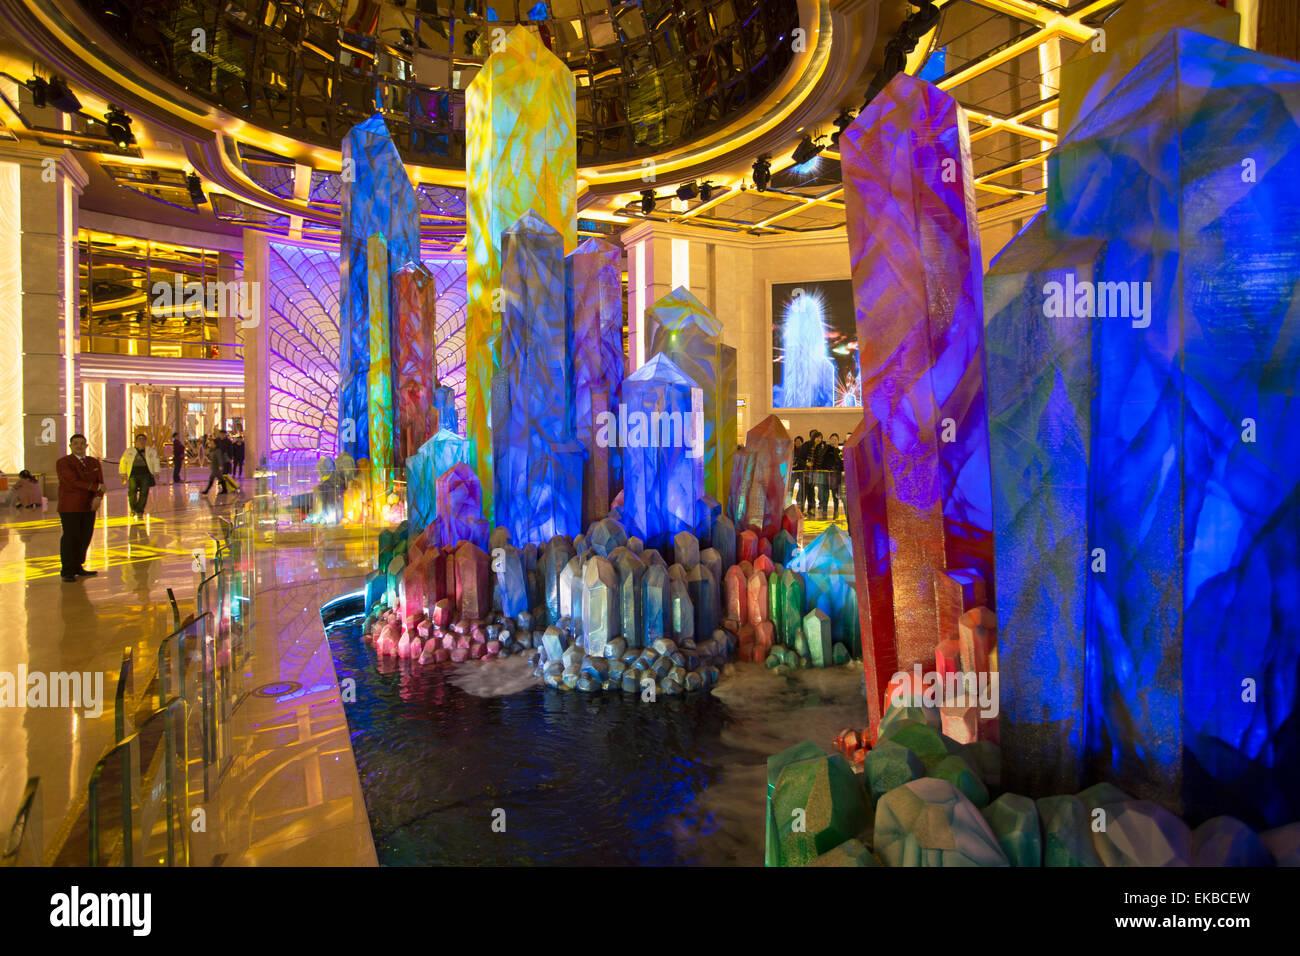 Hall de l'hôtel Galaxy en cristal, Taipa, Macao, Chine, Asie Photo Stock